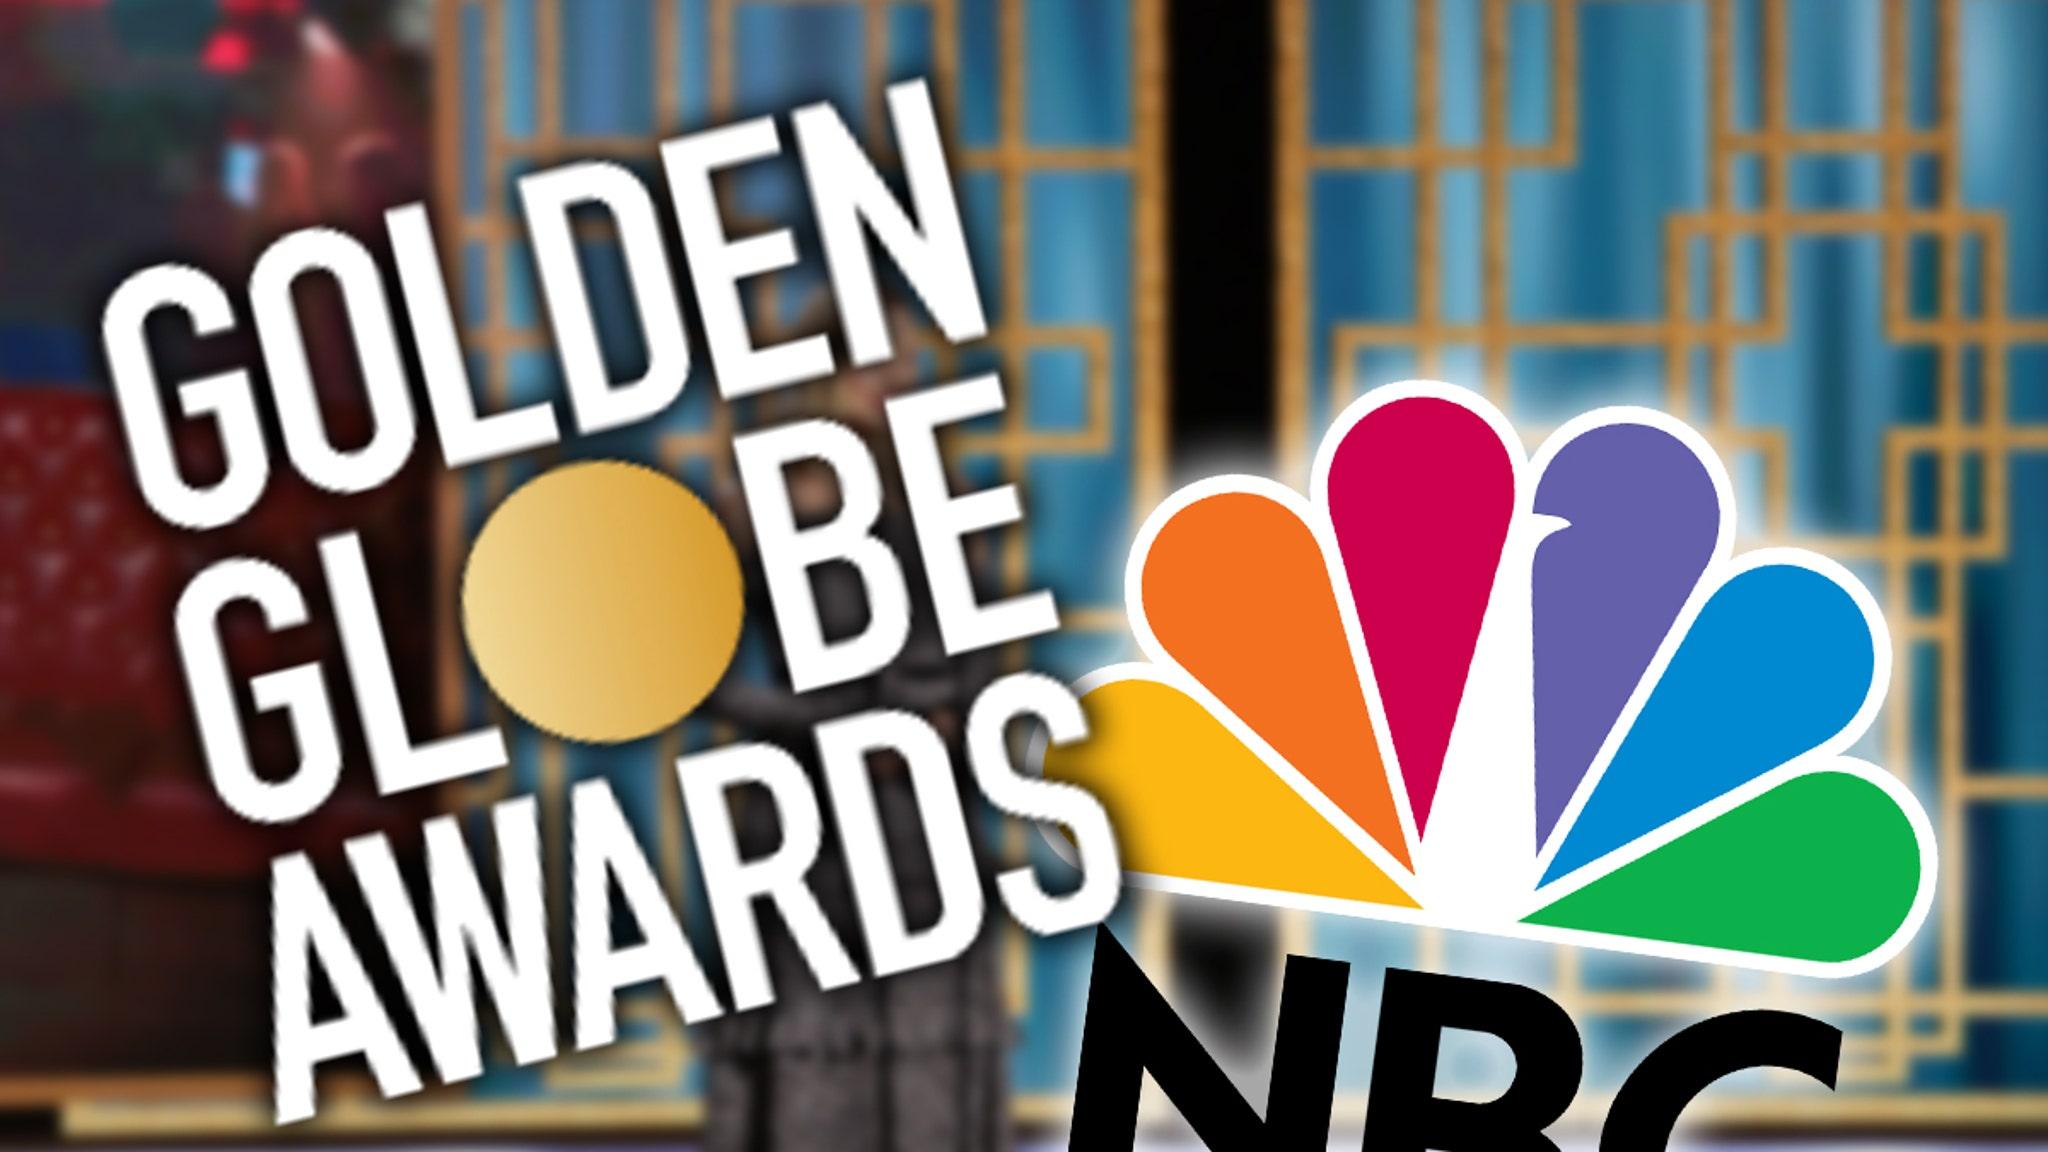 <p>NBC Won't Air 2022 Golden Globes Amid HFPA Controversy, Org Responds thumbnail